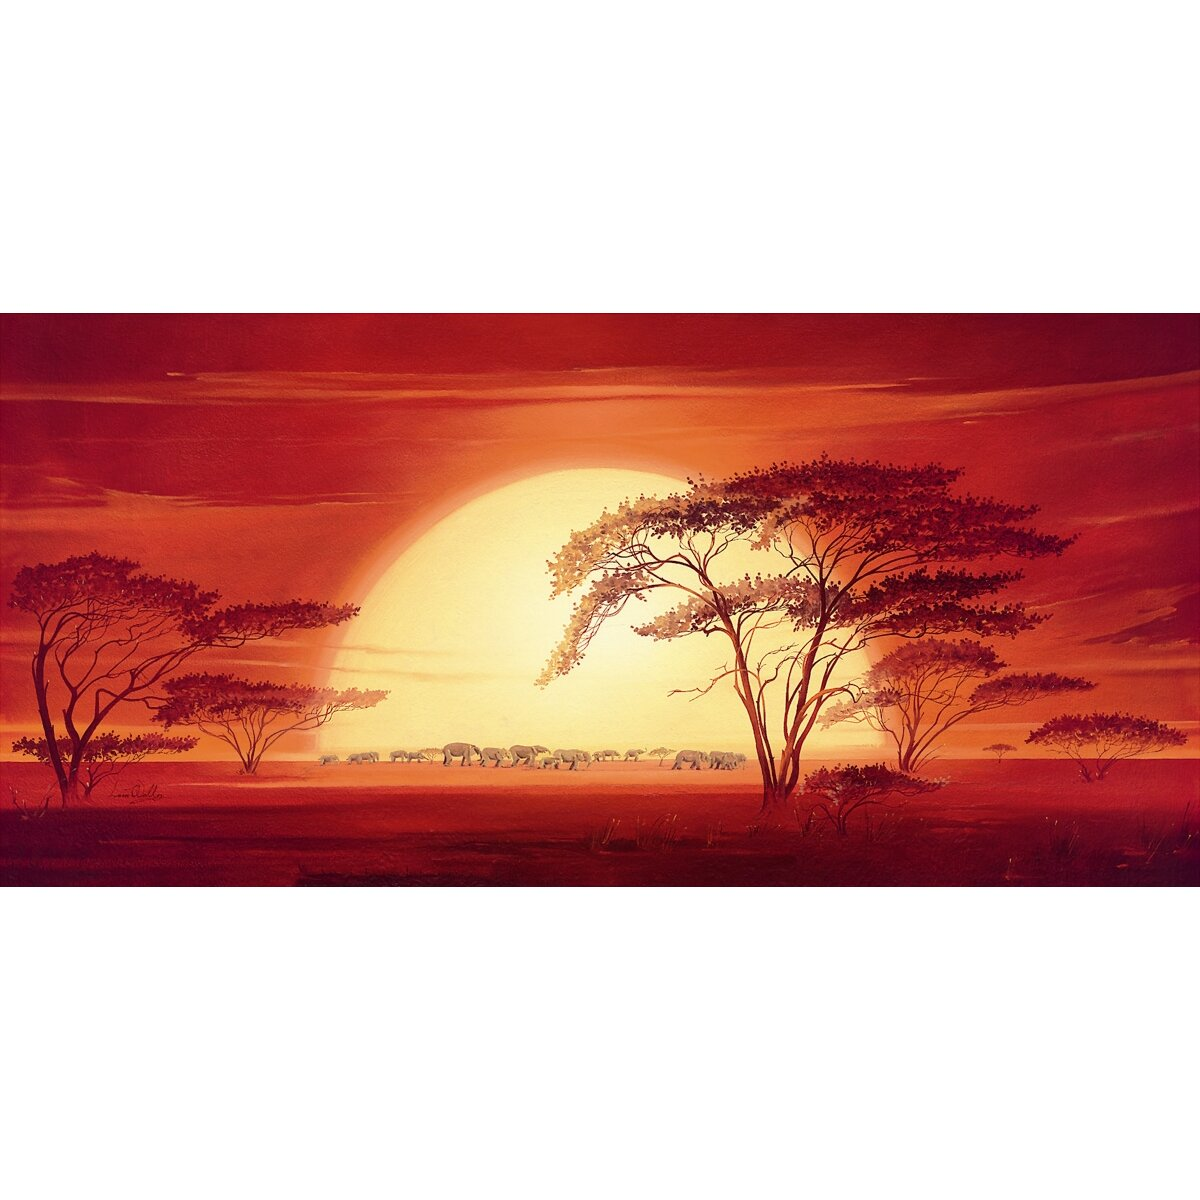 Stretcher Sunrise With Elephants Art Print on Canvas ...